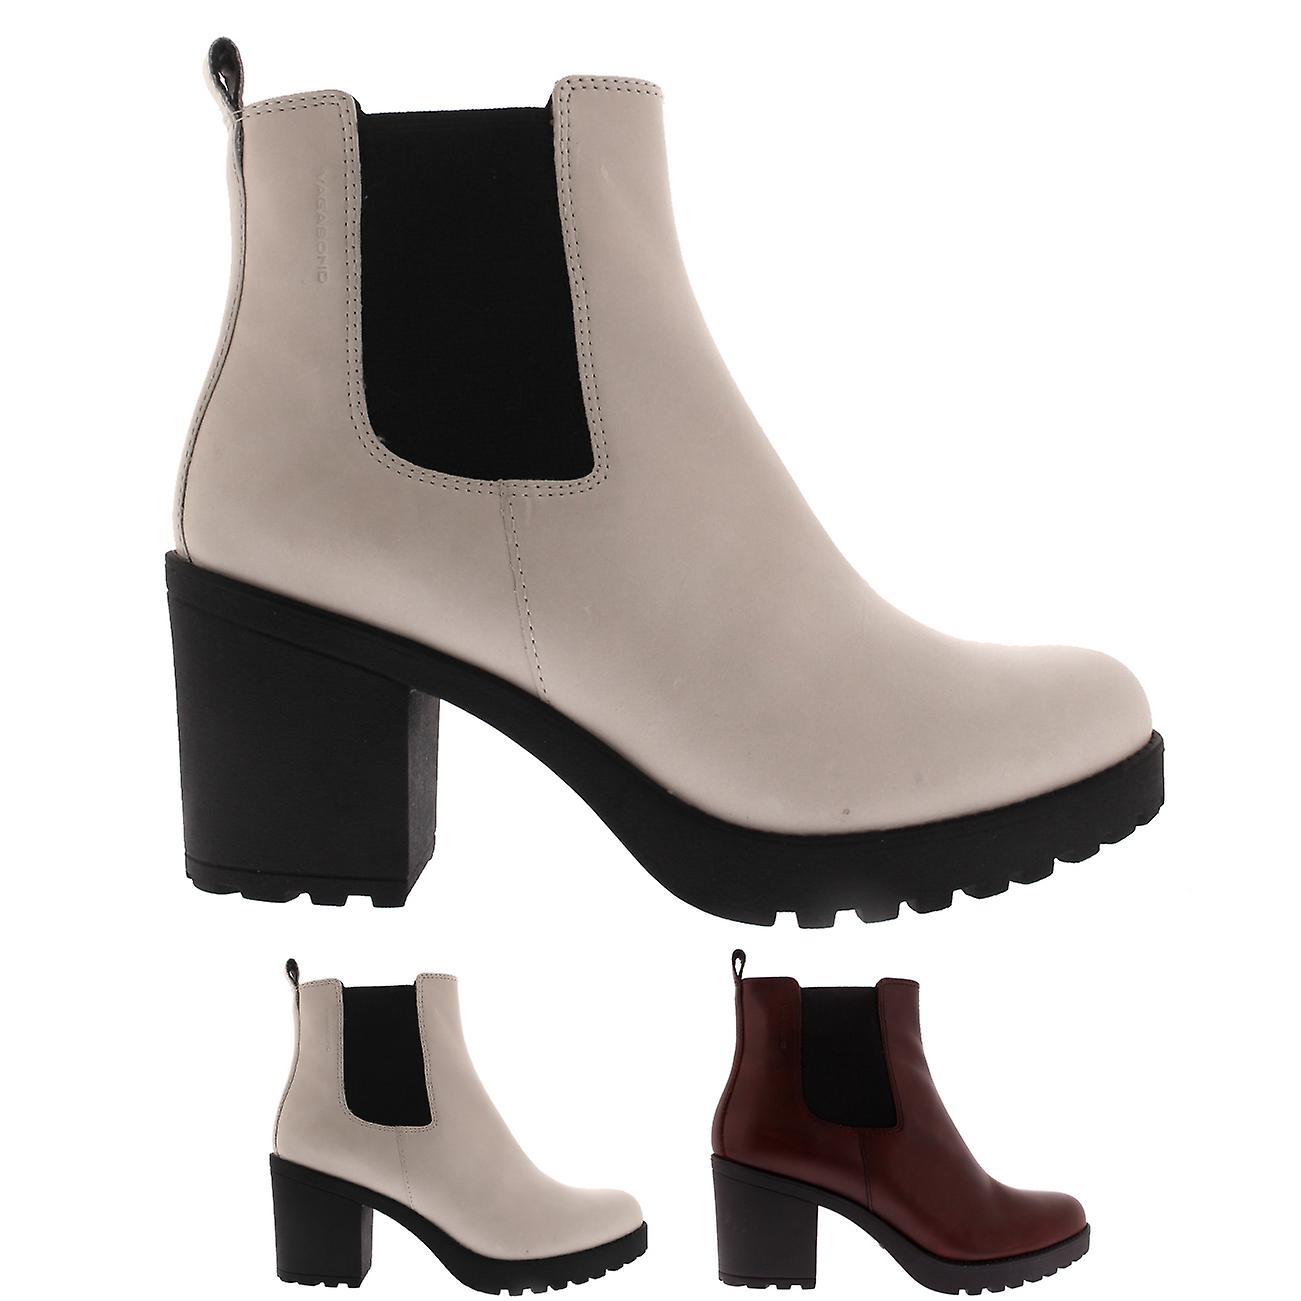 7386bbde63c3 Womens Vagabond Grace Block Heel Closed Toe Elastic Fashion Ankle Boots